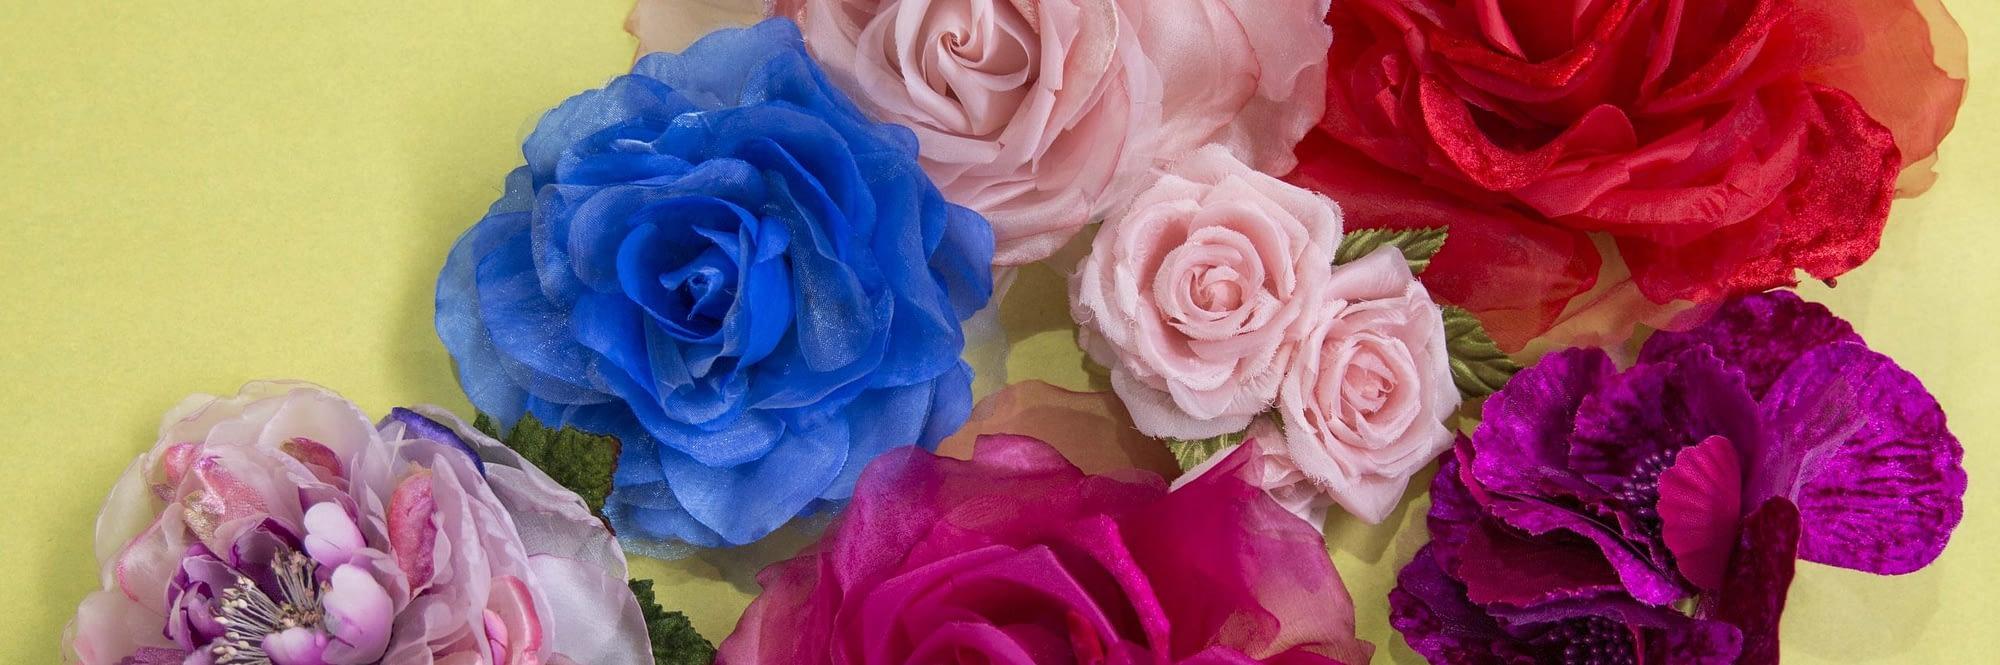 Craft & Millinery Supplies -- silk flowers